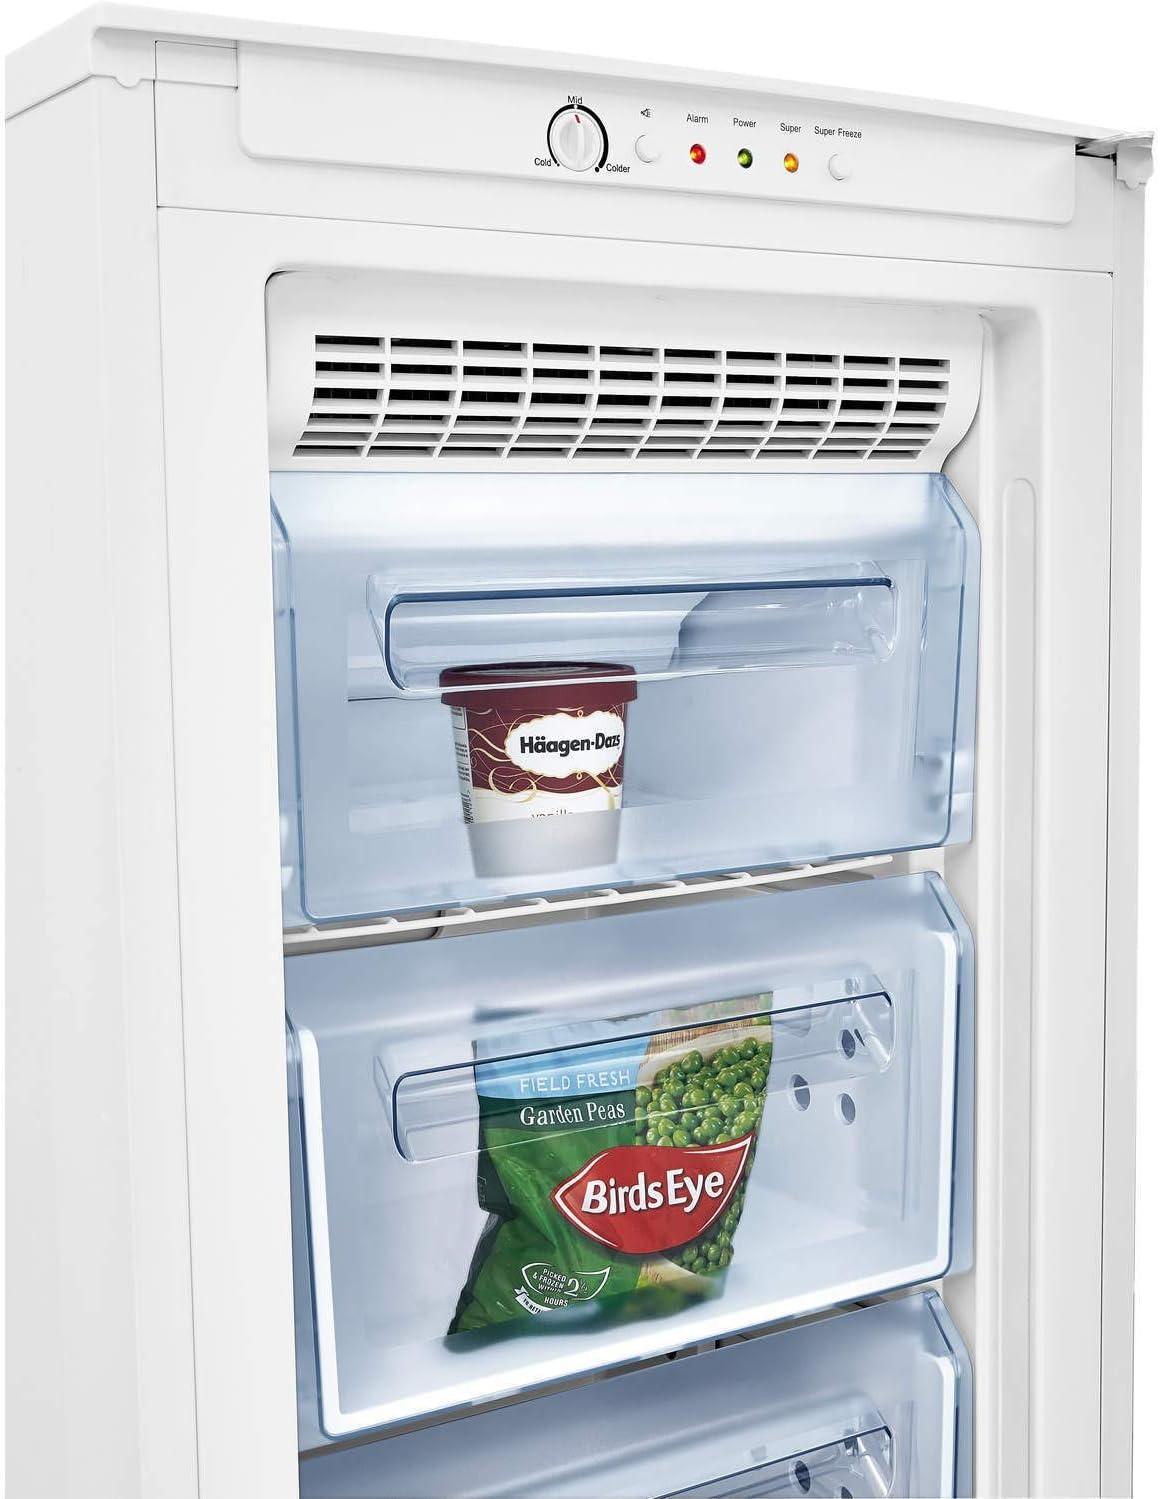 Fridgemaster MTZ55183FF Congelador vertical de 55 cm de ancho color blanco